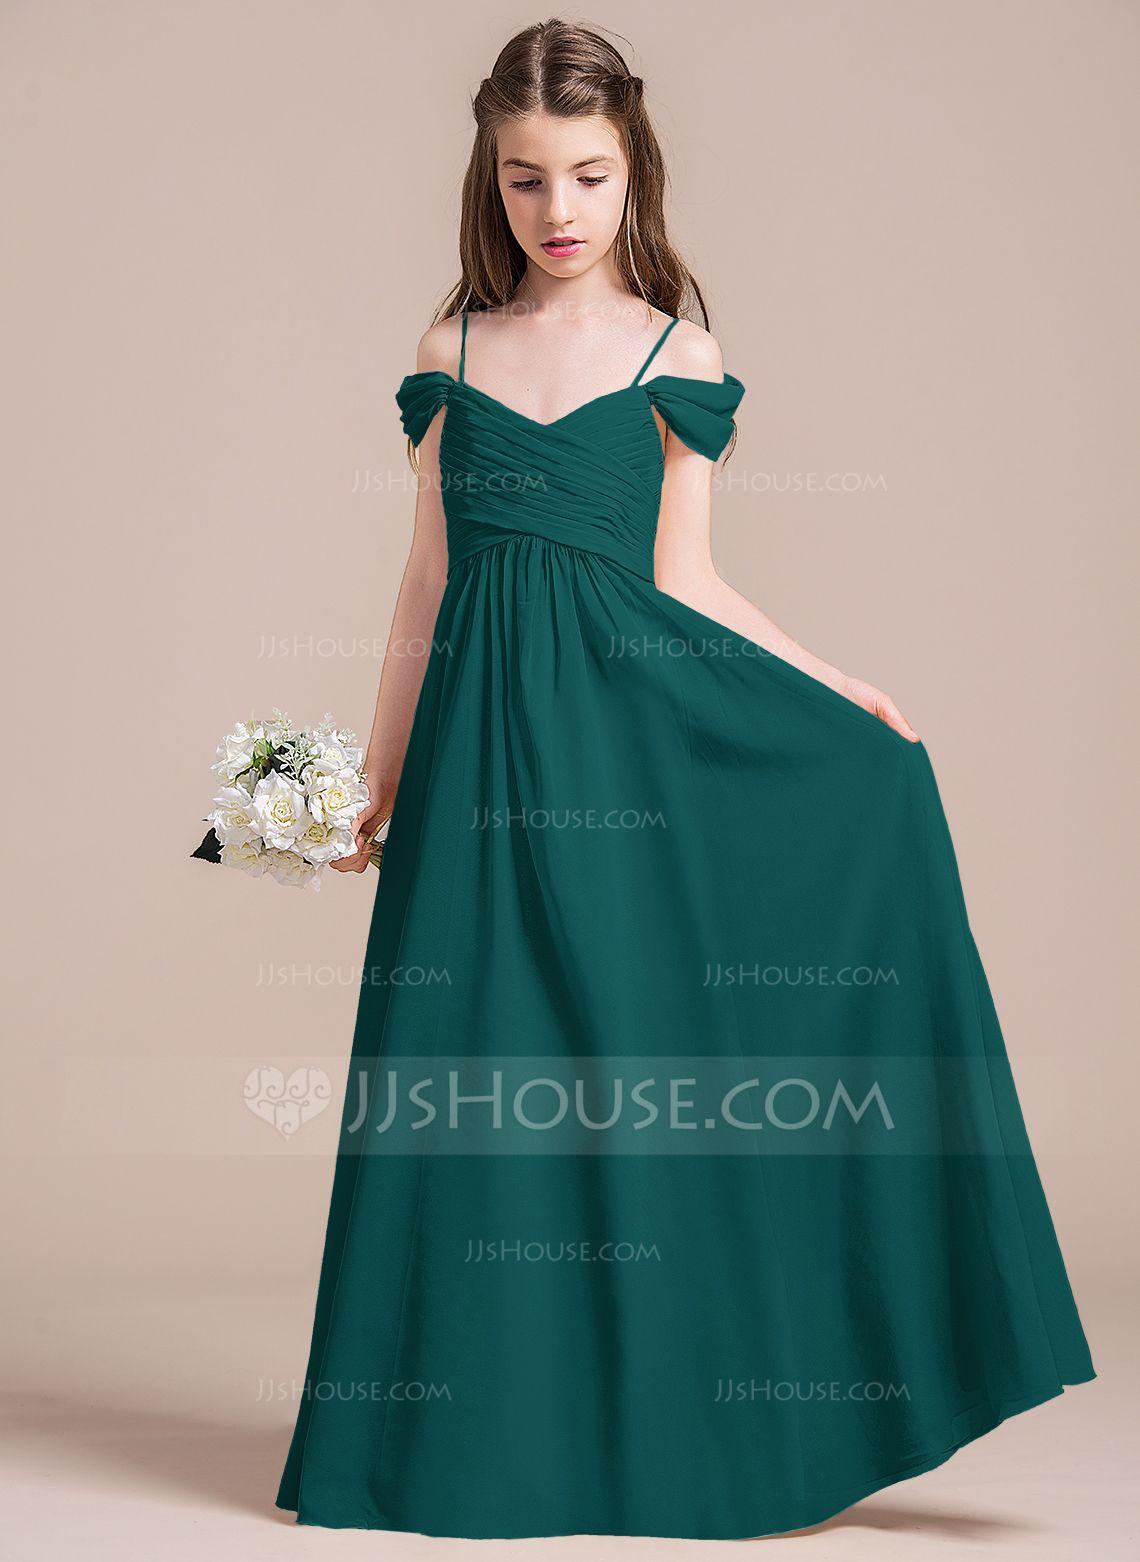 560ceabd78 A-Line Princess Off-the-Shoulder Floor-Length Chiffon Junior Bridesmaid  Dress With Ruffle (009087895) - Junior Bridesmaid Dresses - JJsHouse